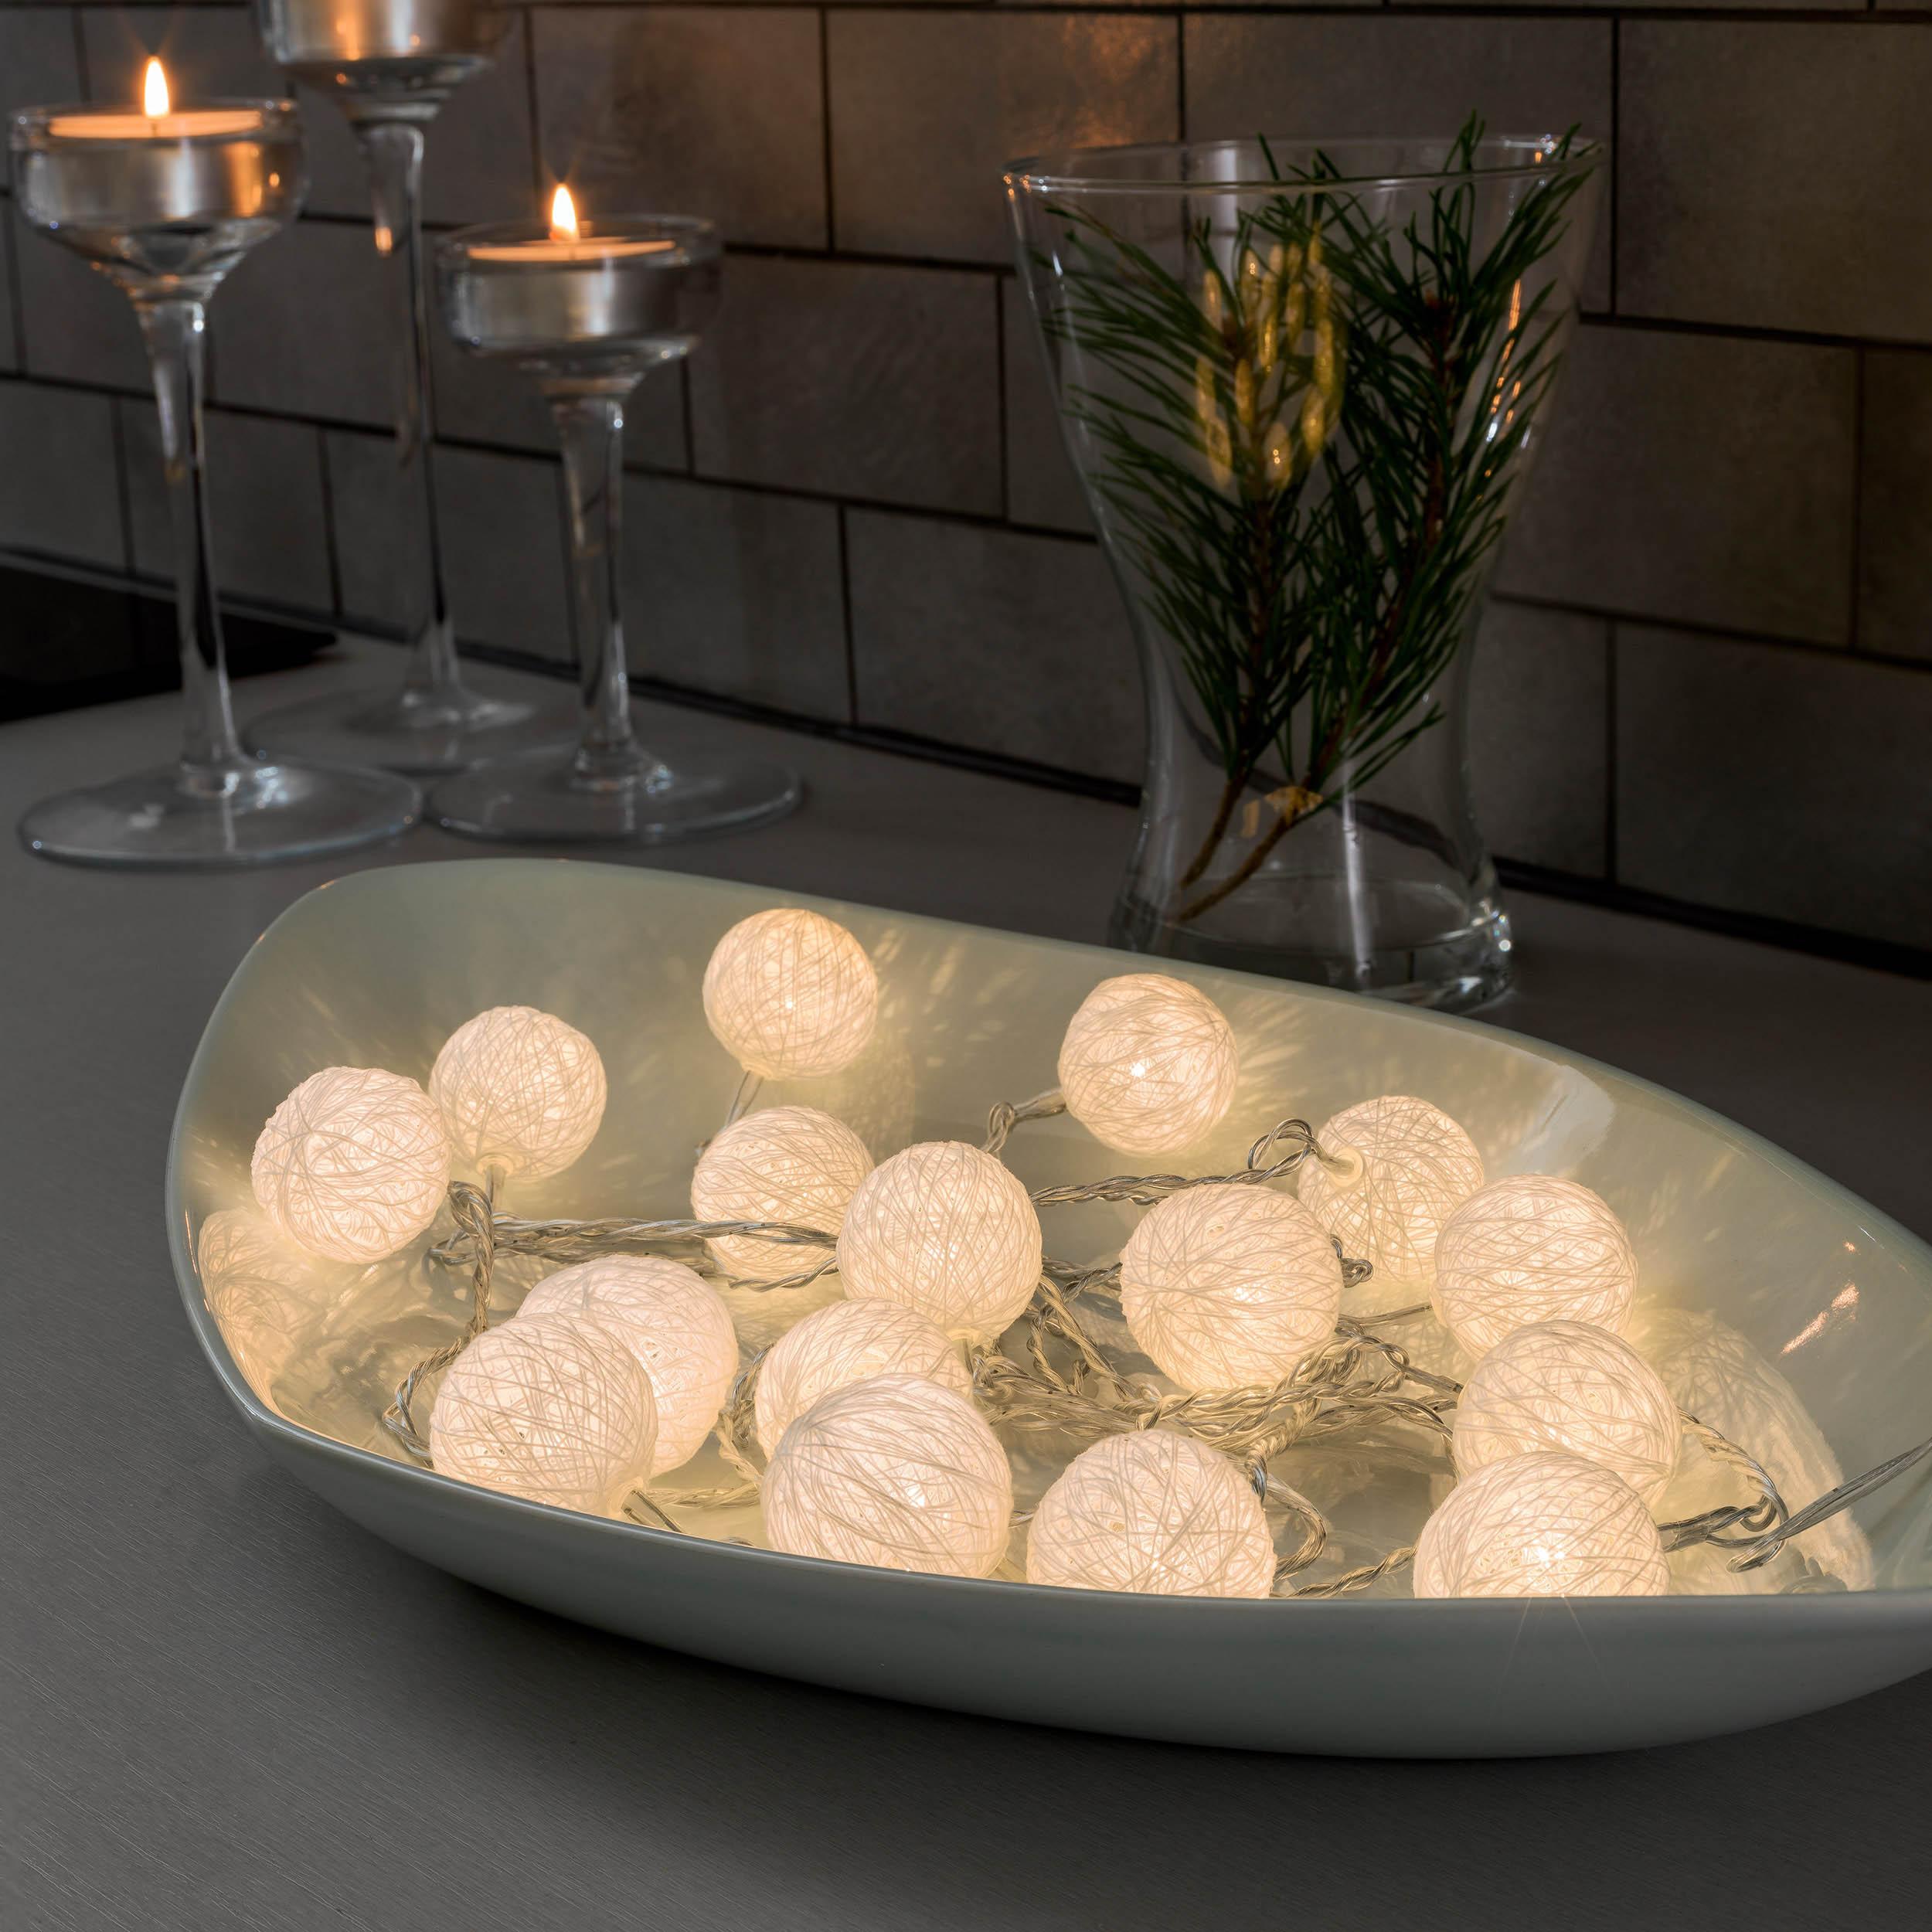 Konstsmide LED-Dekolichterkette, weiße Baumwollkugeln, 3,5 cm 3135-103